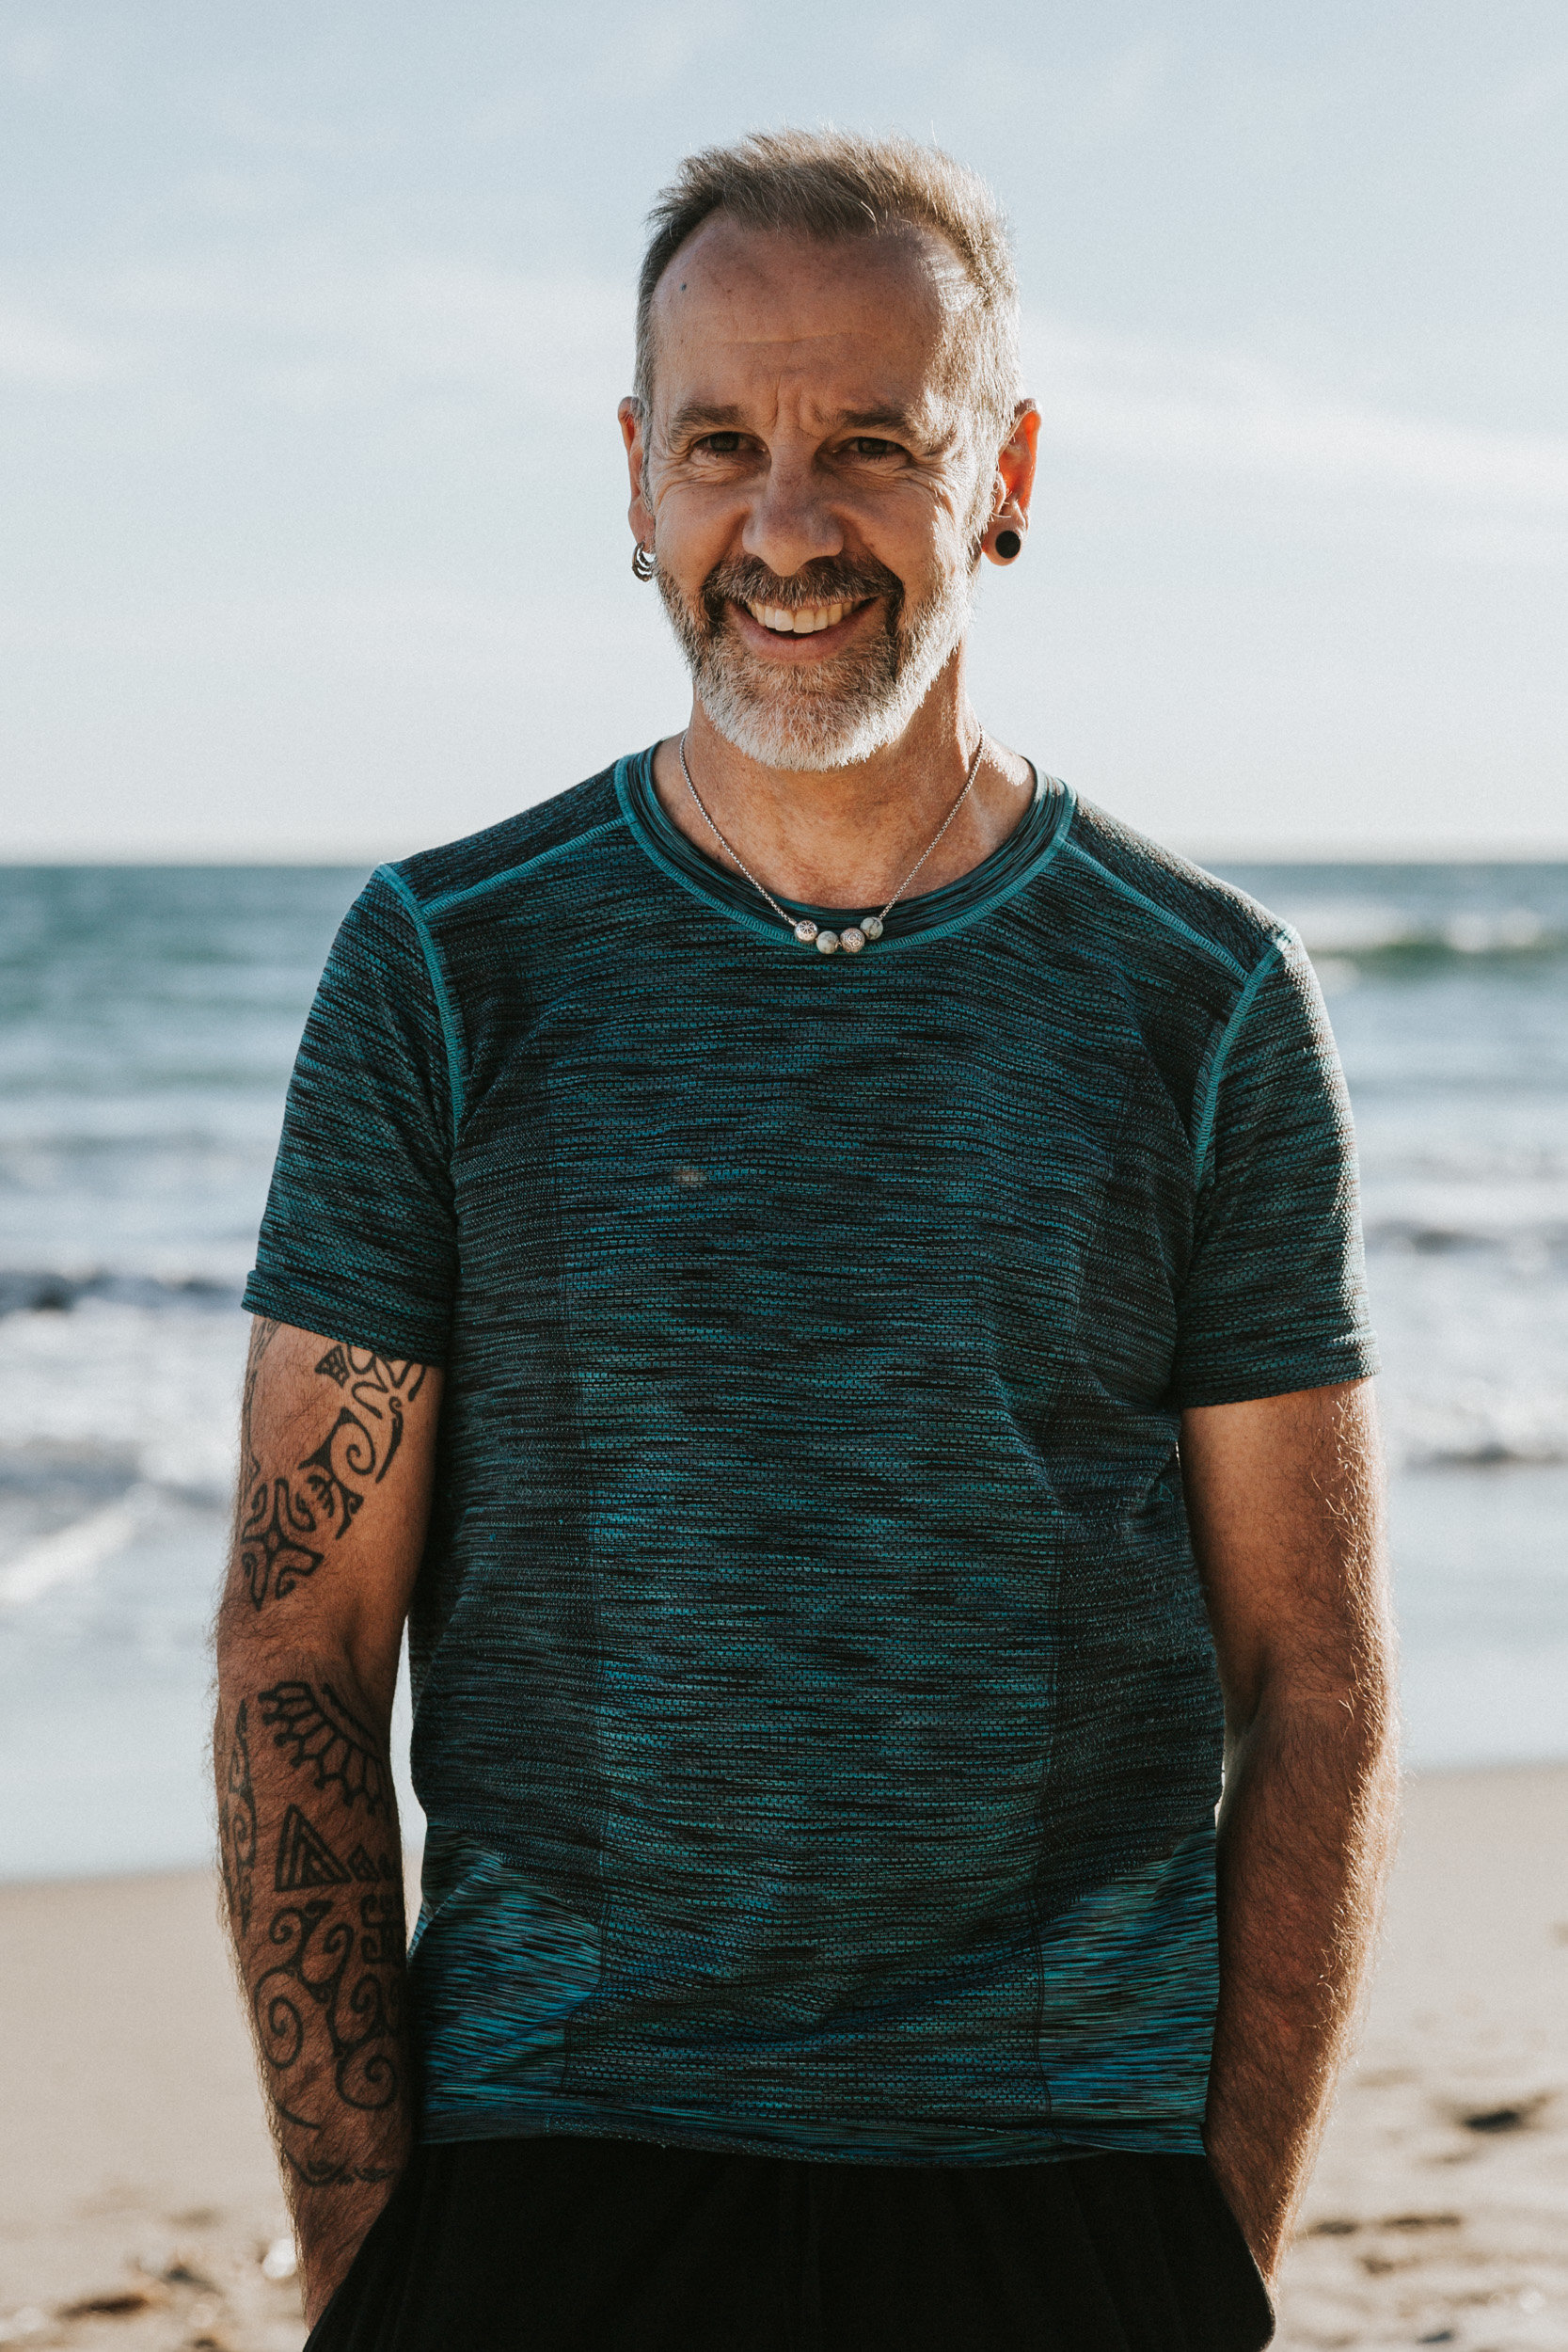 Christophe Ziegelmeyer